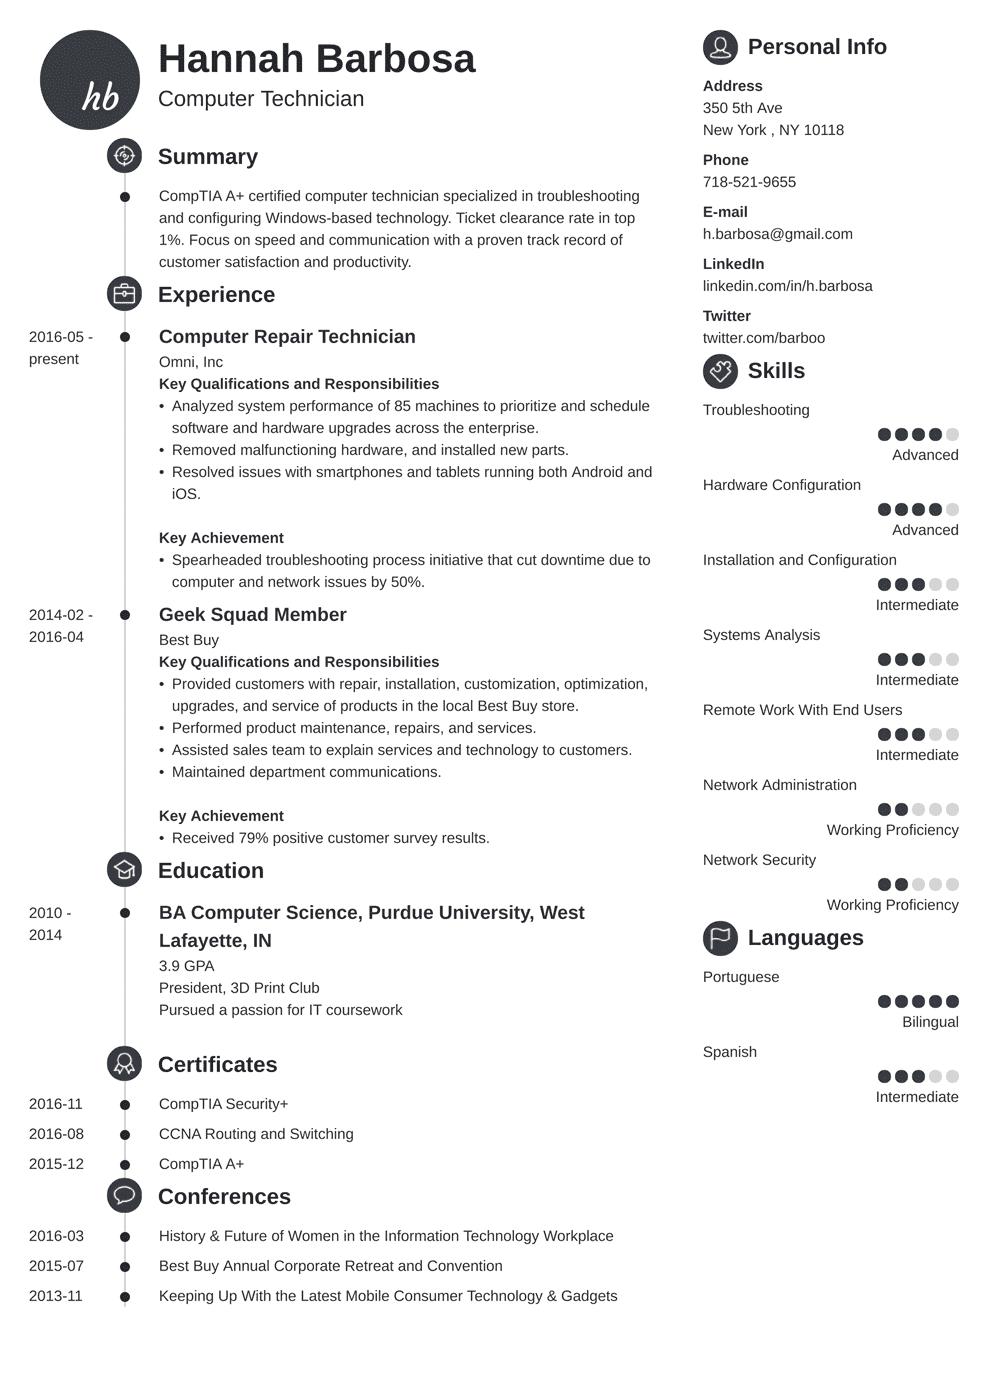 computer technician resume template primo in 2020 Resume